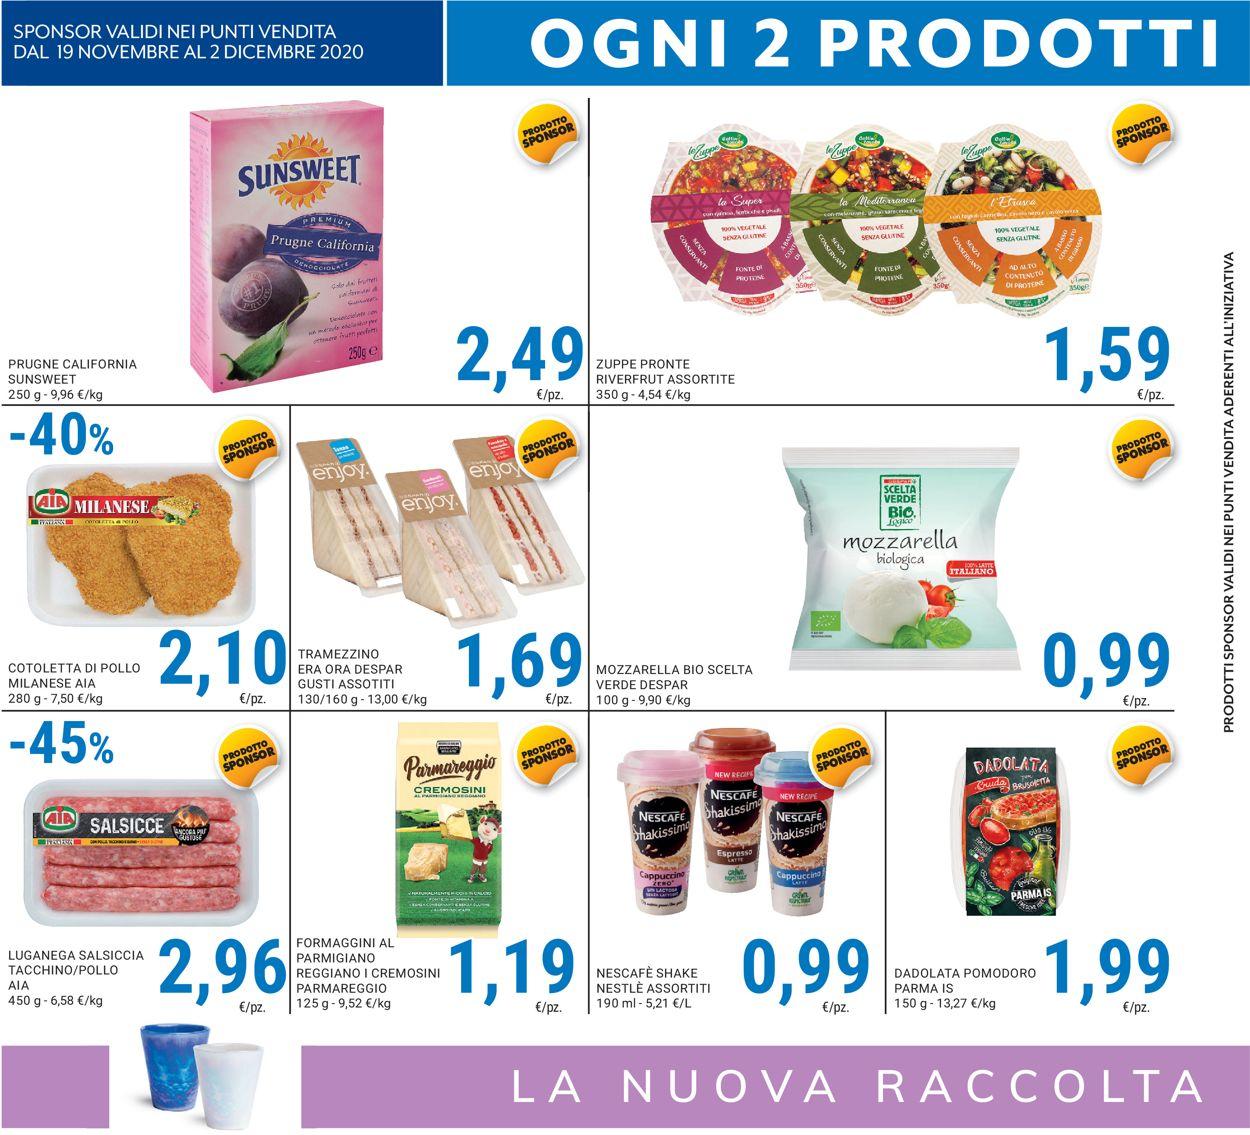 Volantino Interspar - Black Friday 2020 - Offerte 19/11-02/12/2020 (Pagina 4)